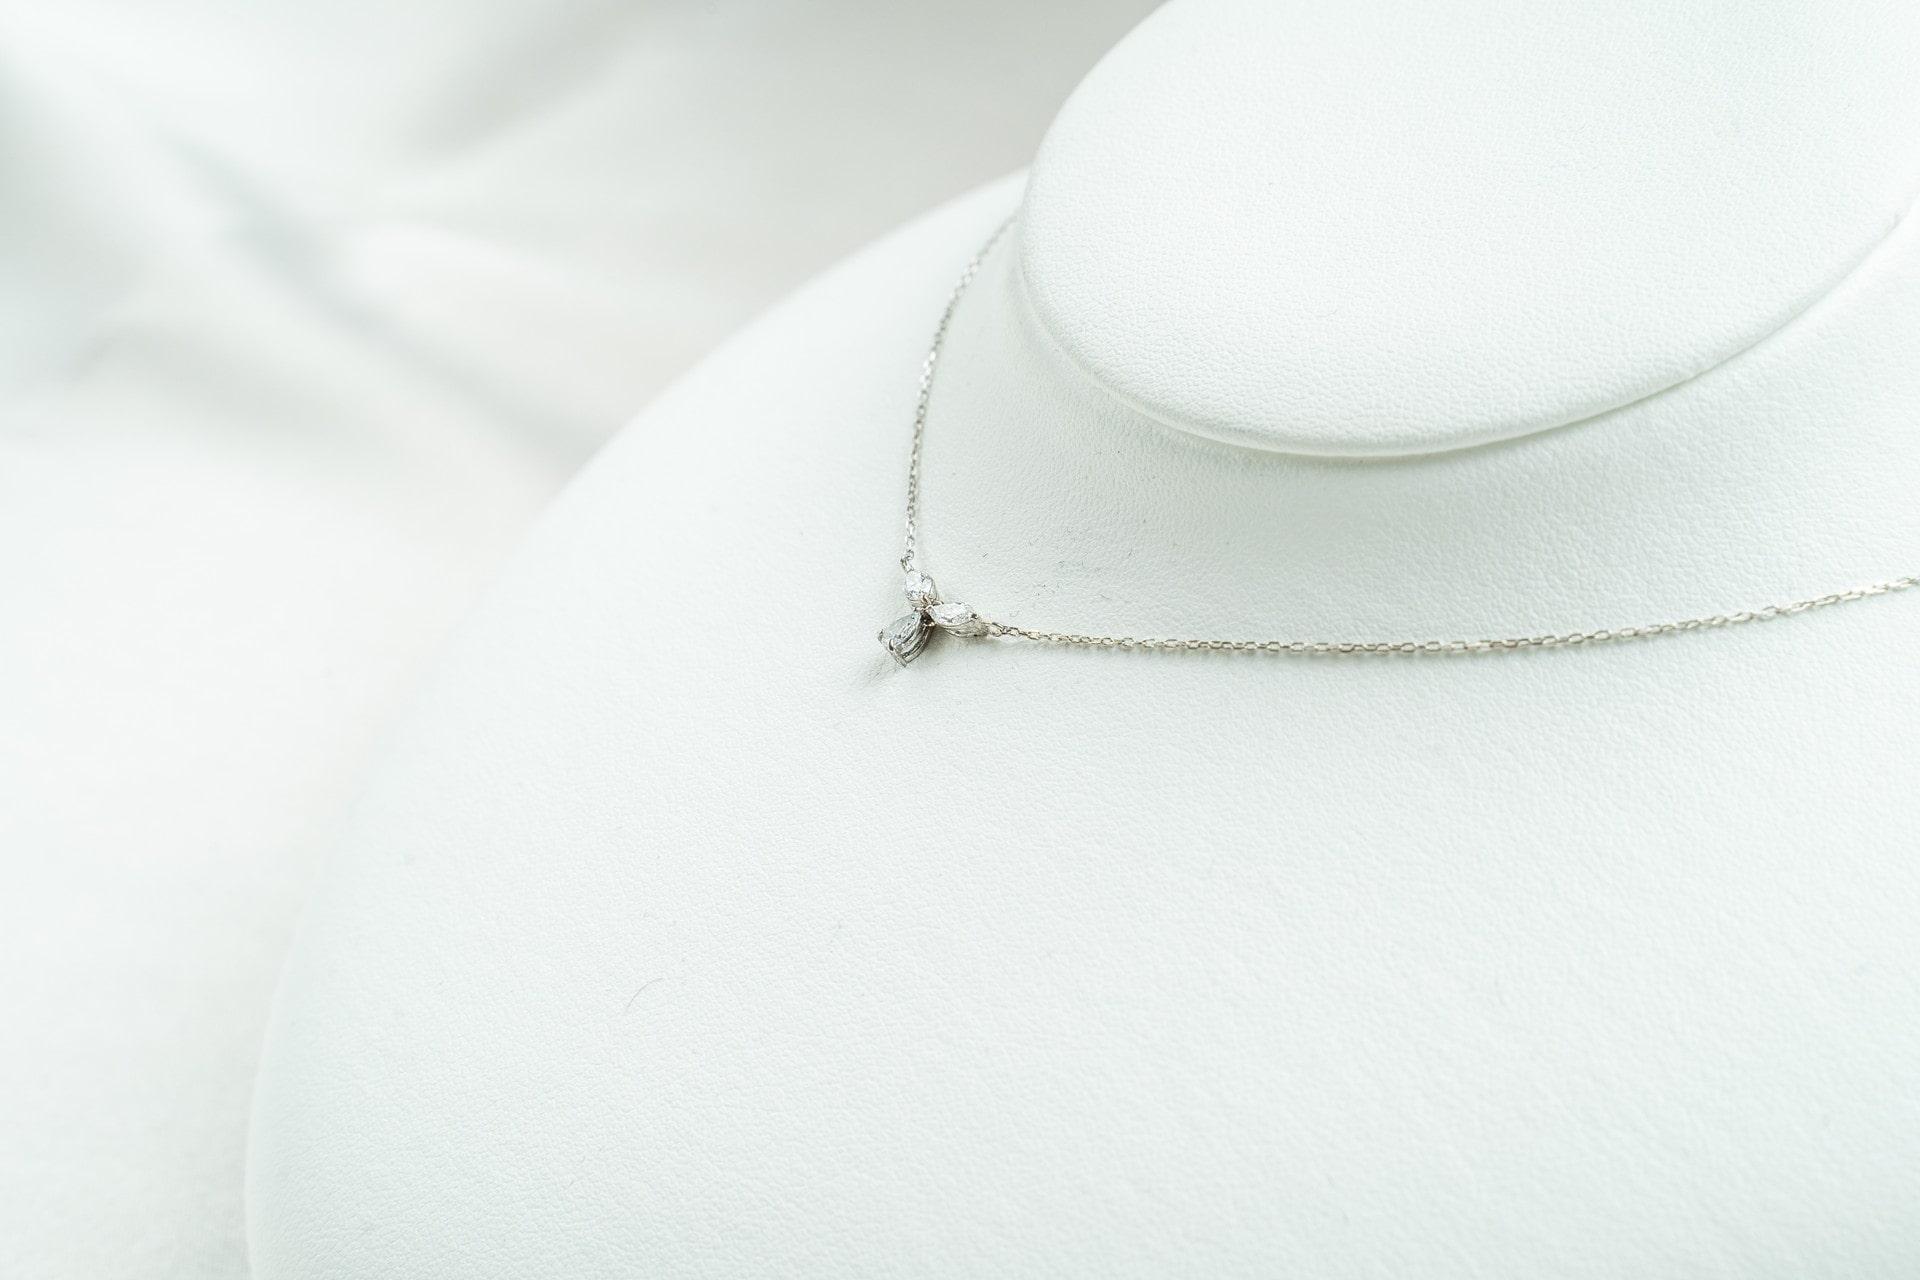 K14WG,ダイヤモンド,ネックレス,ホワイトゴールド